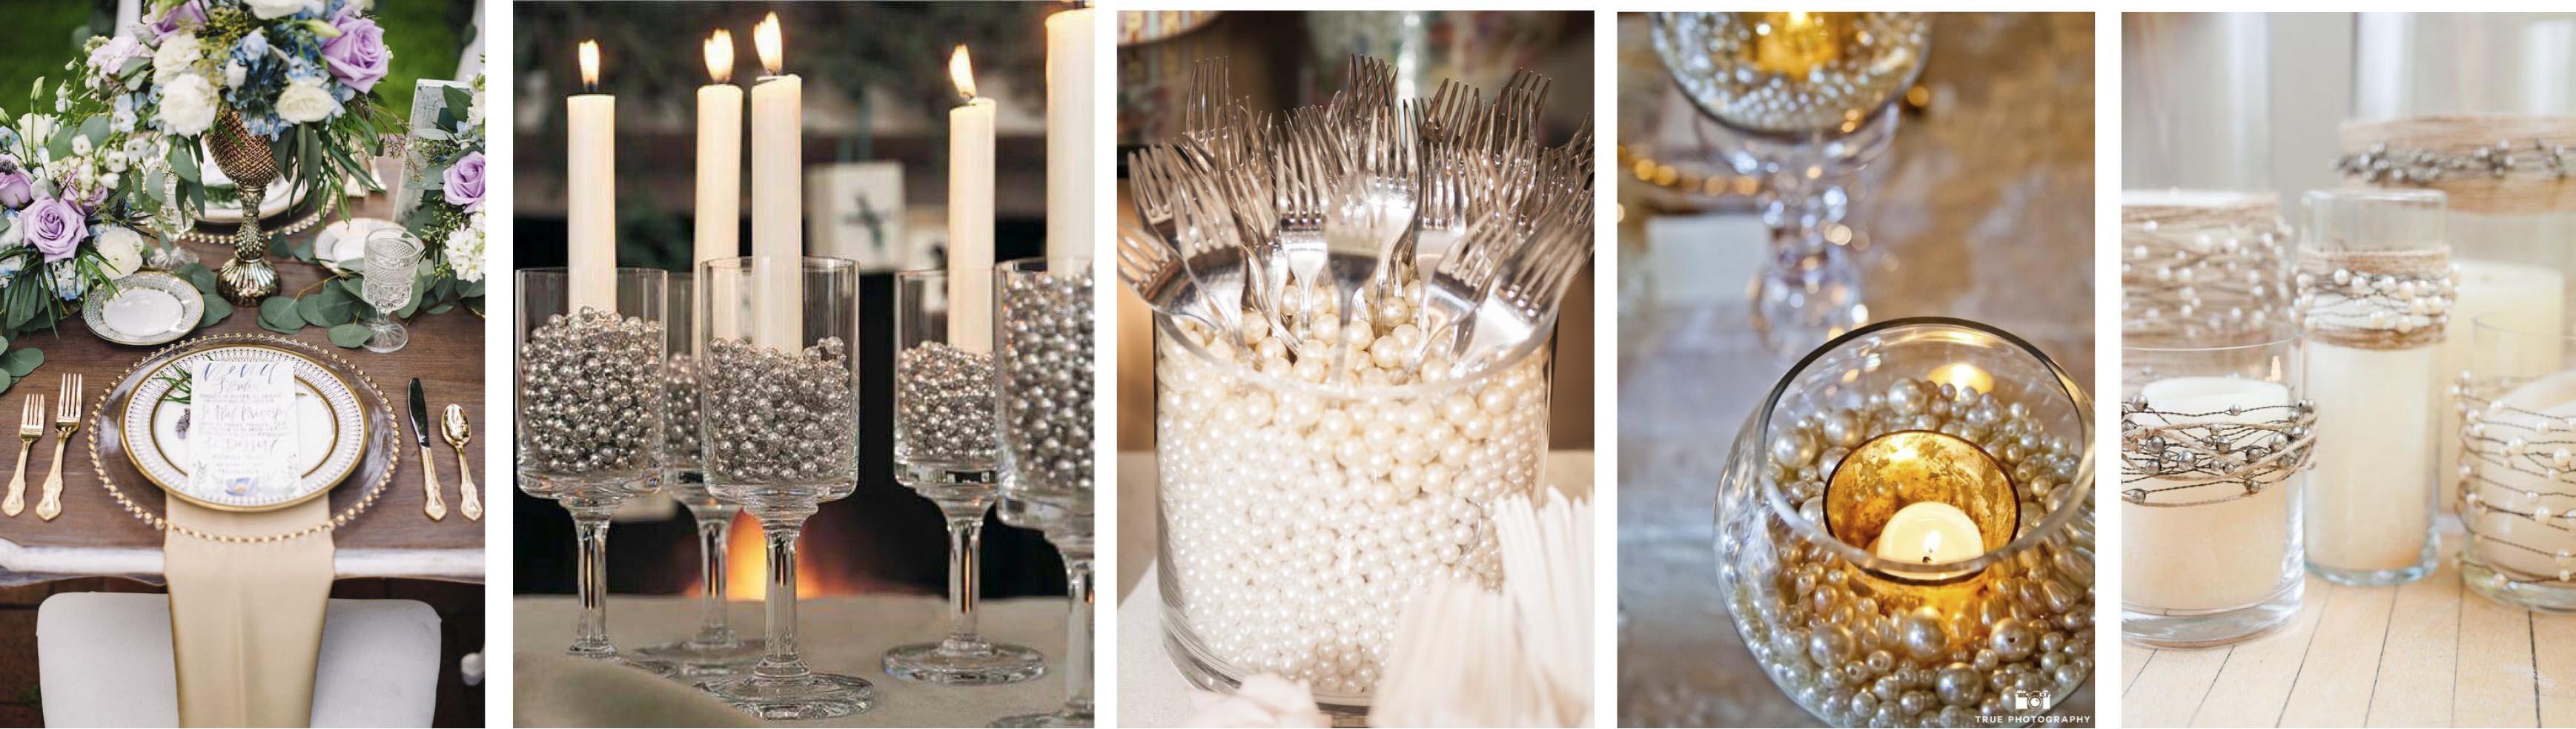 Decoración de bodas con perlas